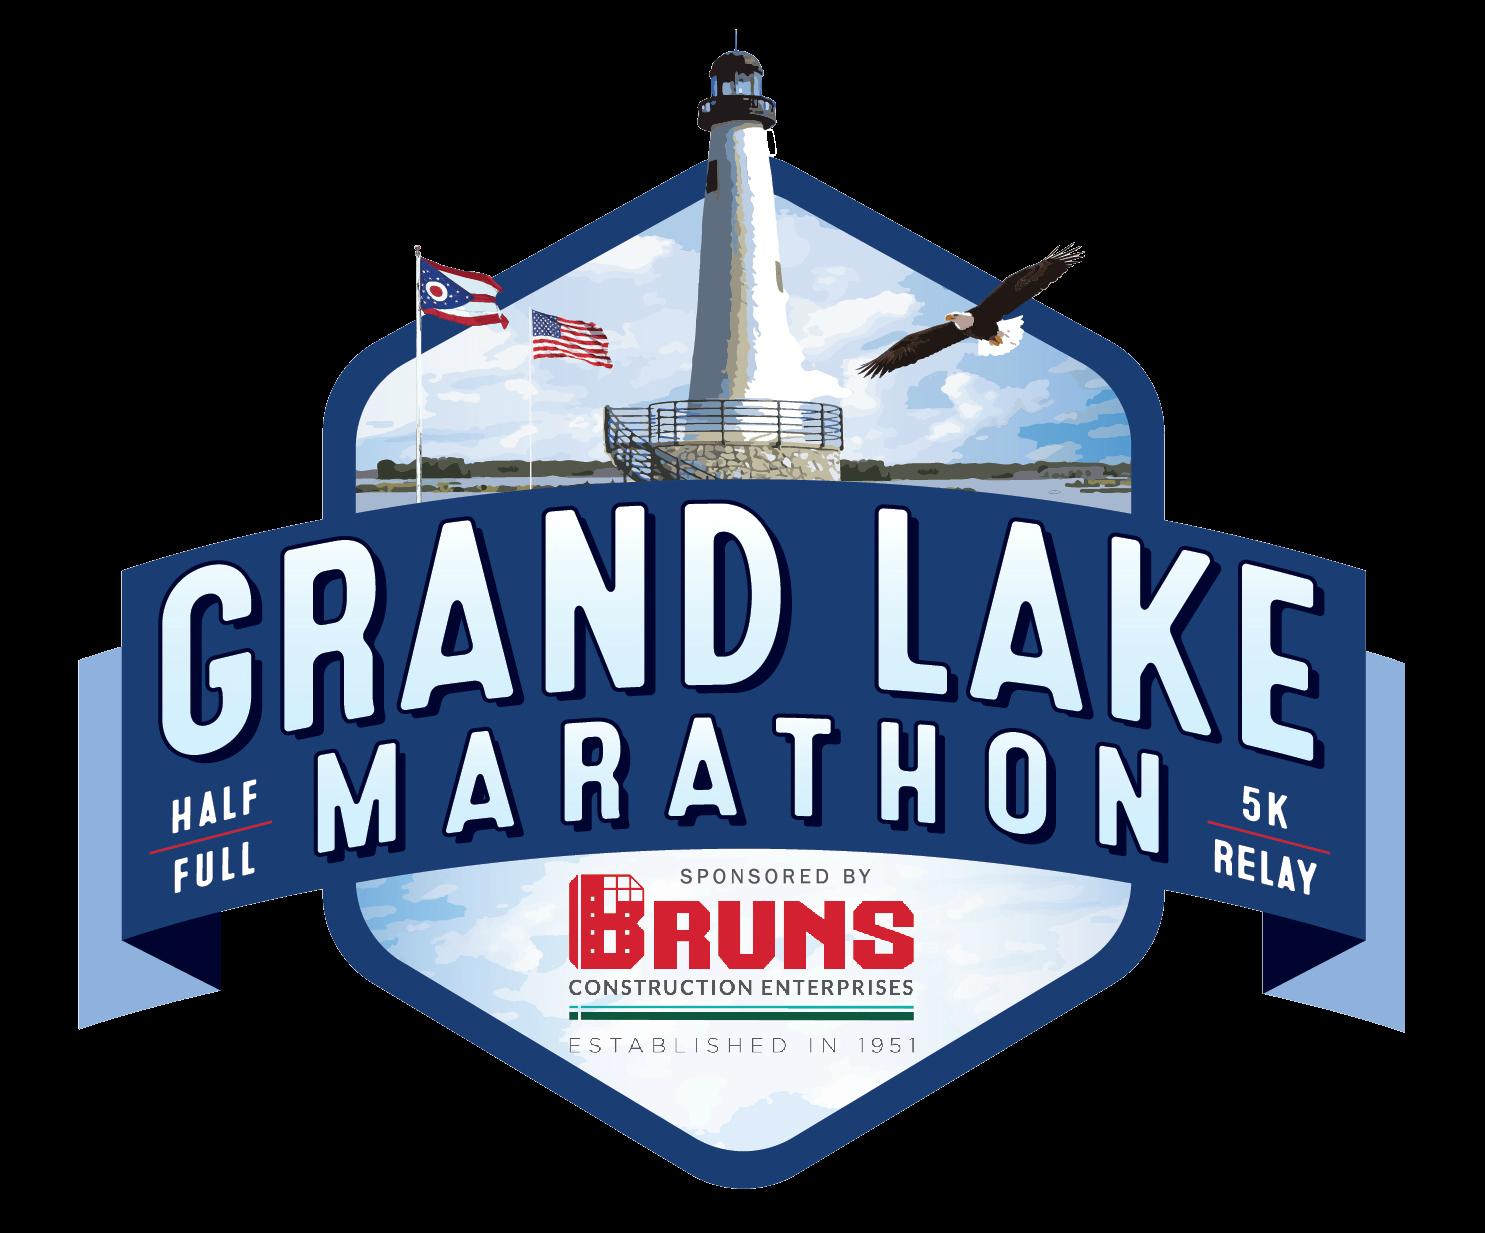 Grand-Lake-Marathon-2019